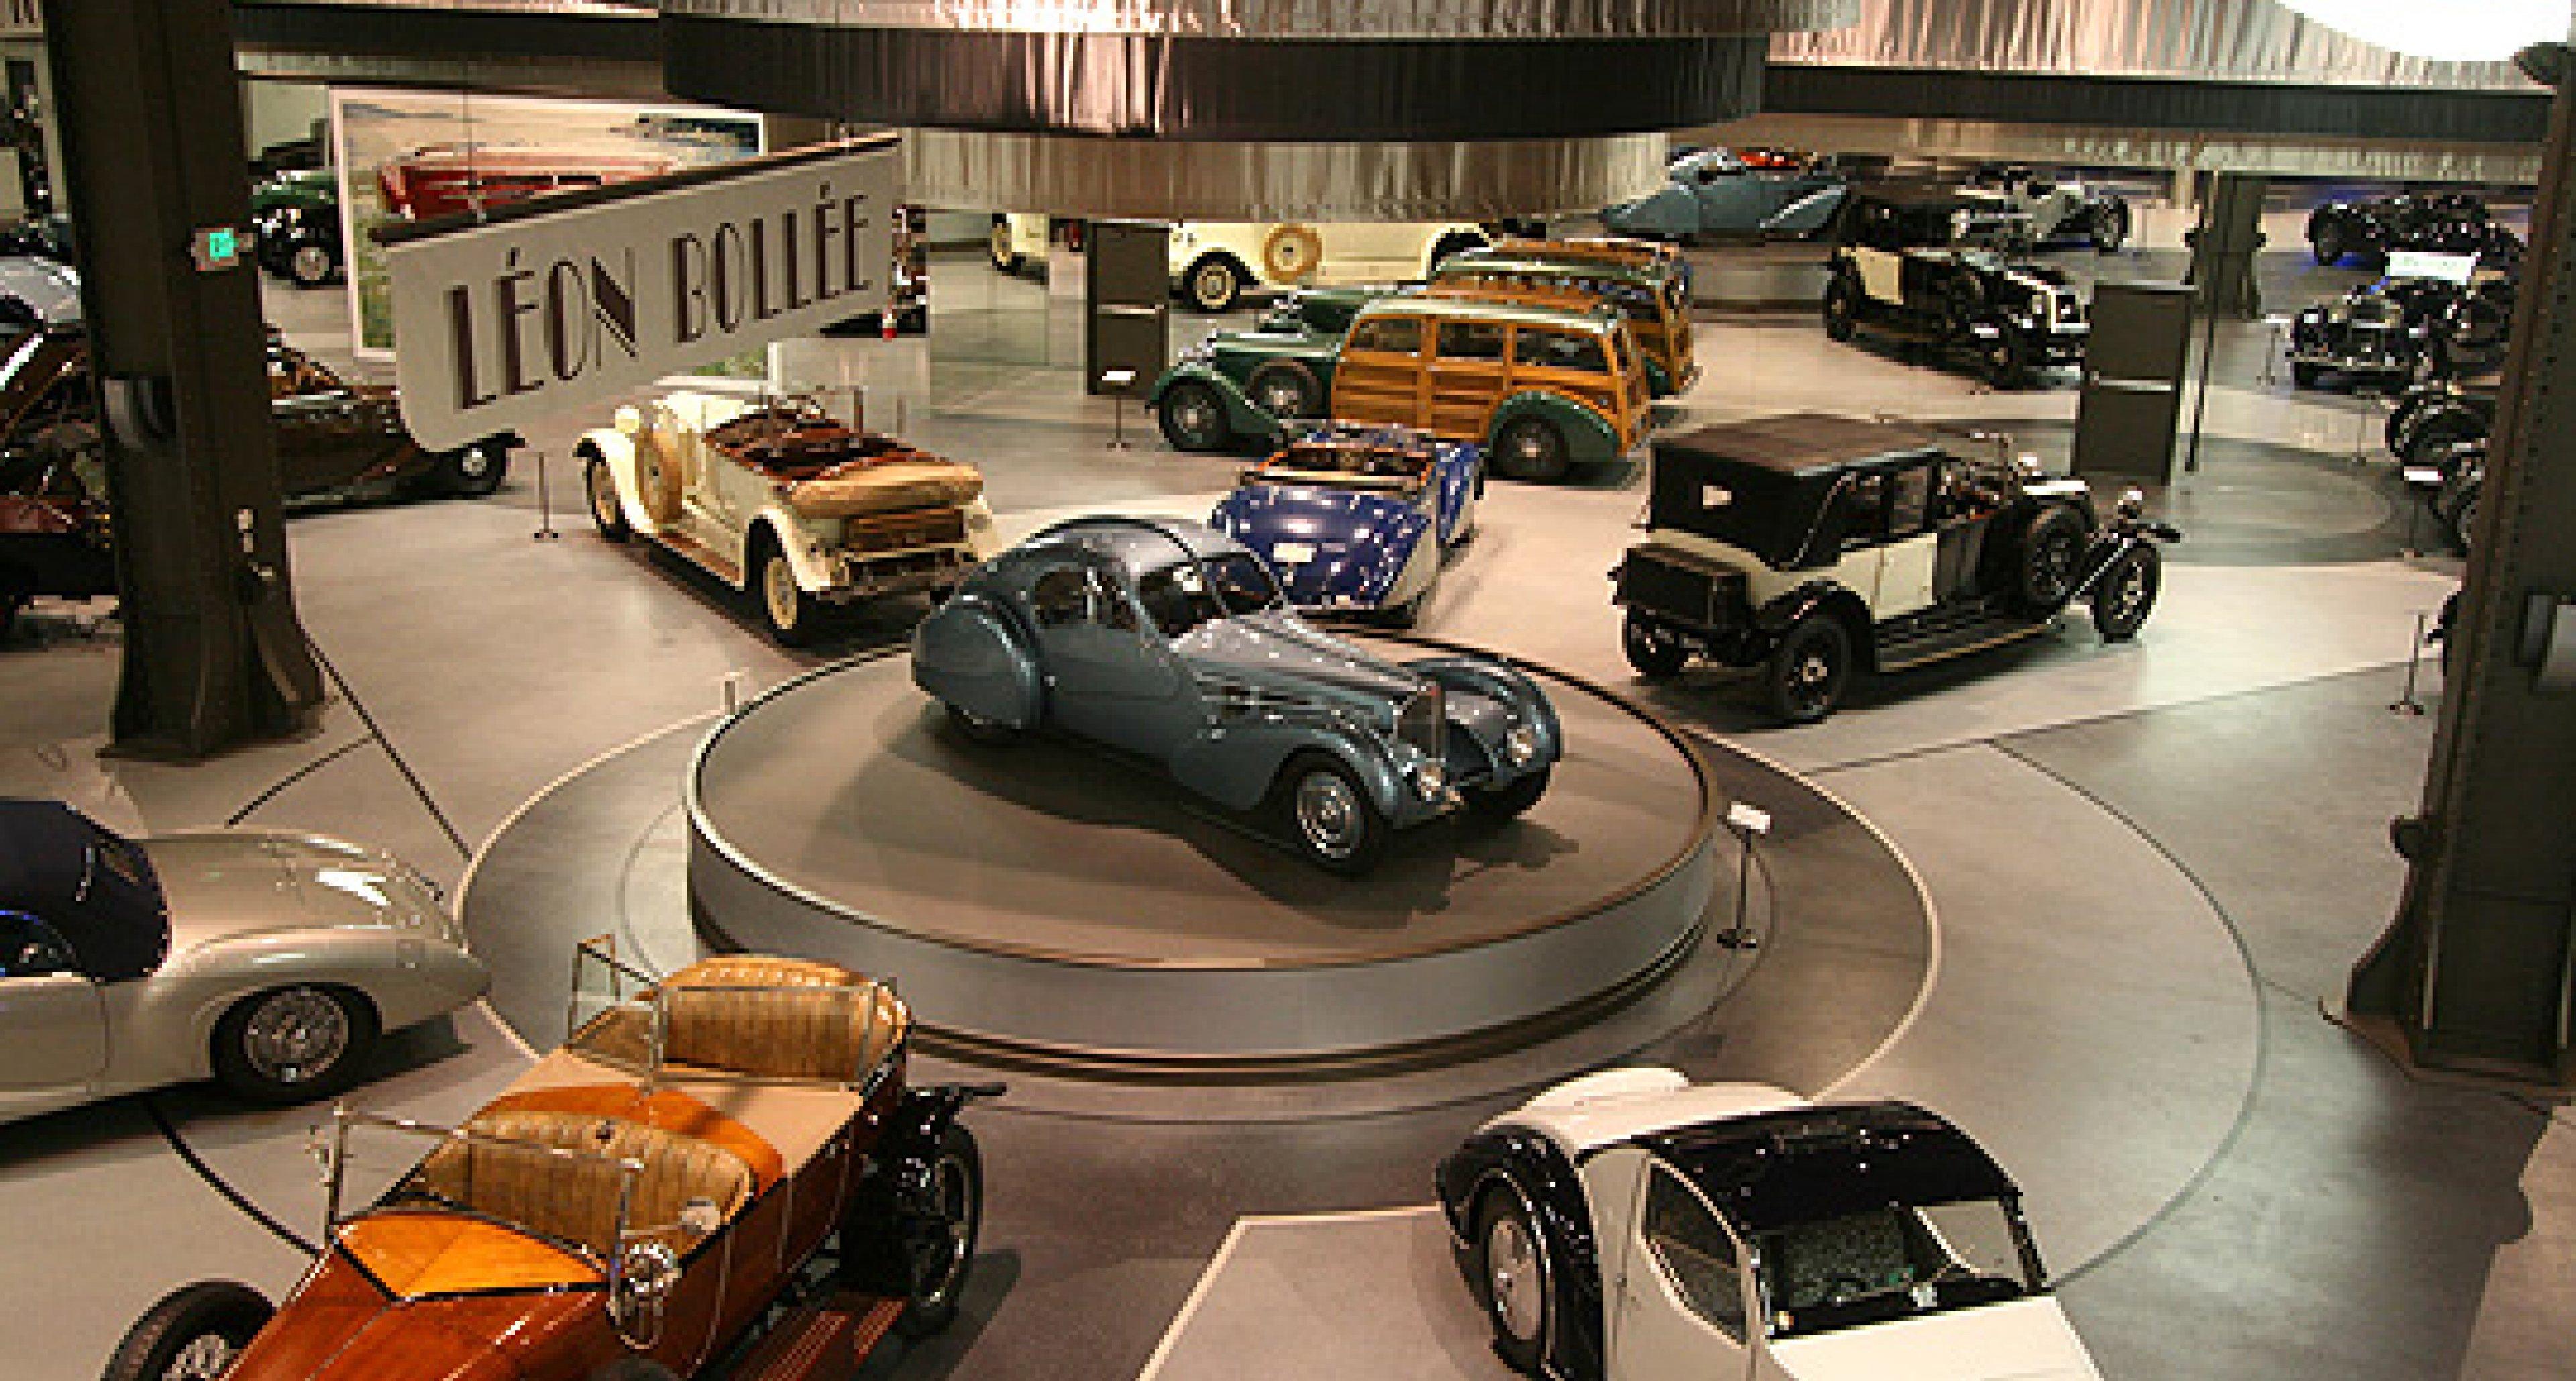 Mullin Automotive Museum: Art Déco in Kalifornien